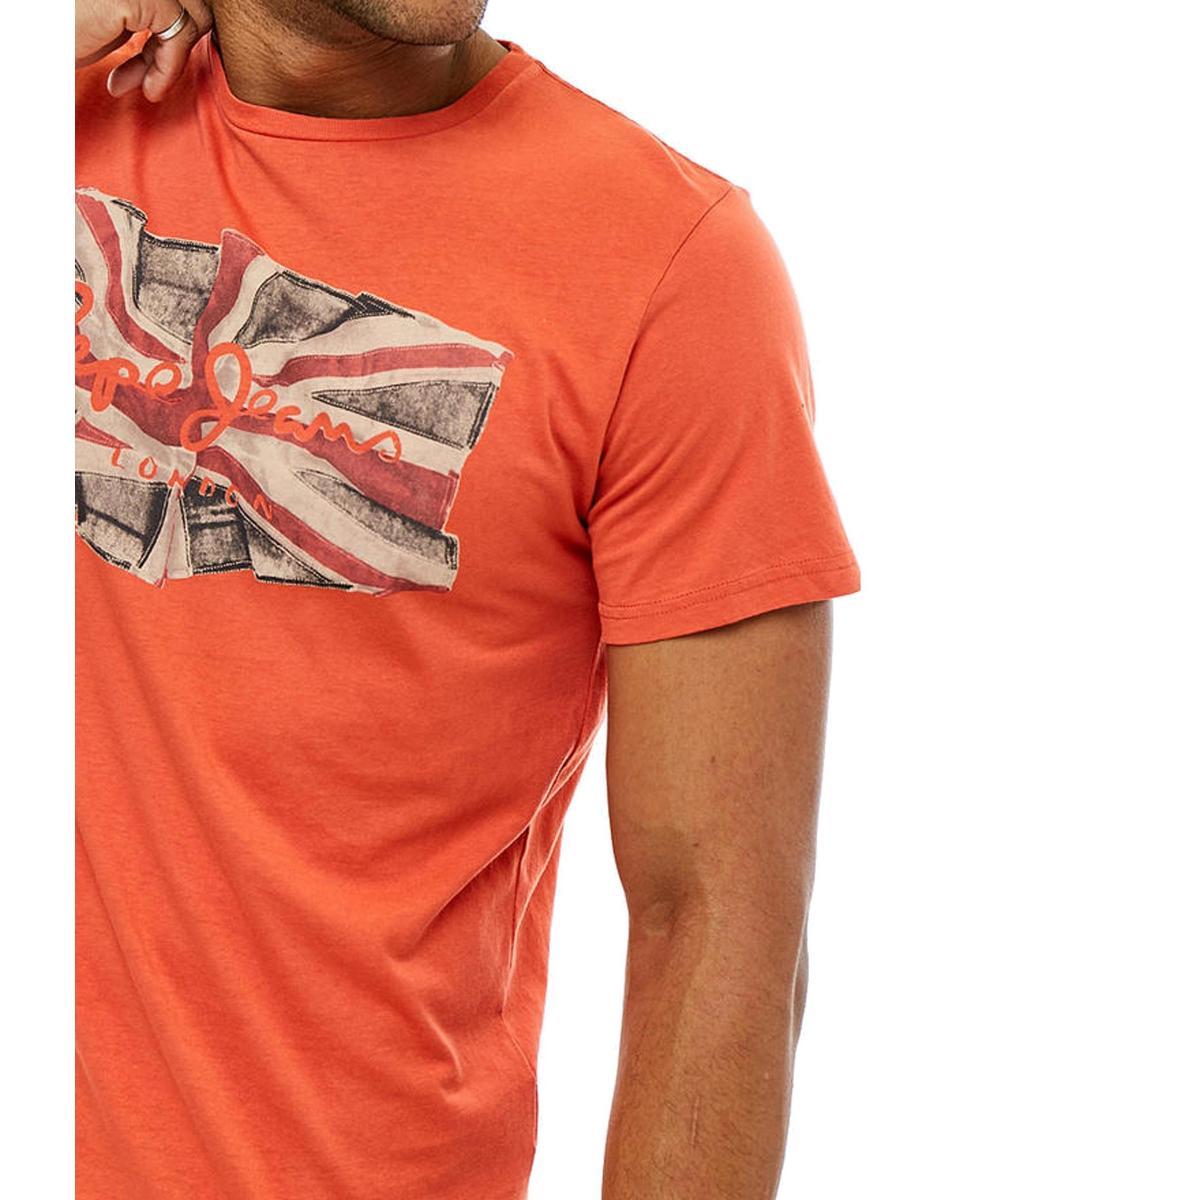 T-shirt Pepe Jeans con stampa da uomo rif. PM505671 FLAG LOGO